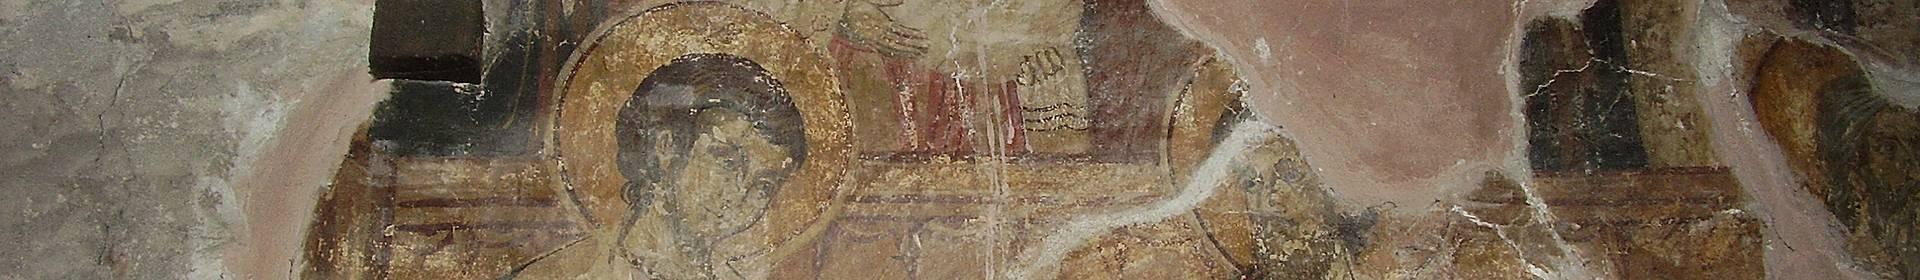 Ardenicë